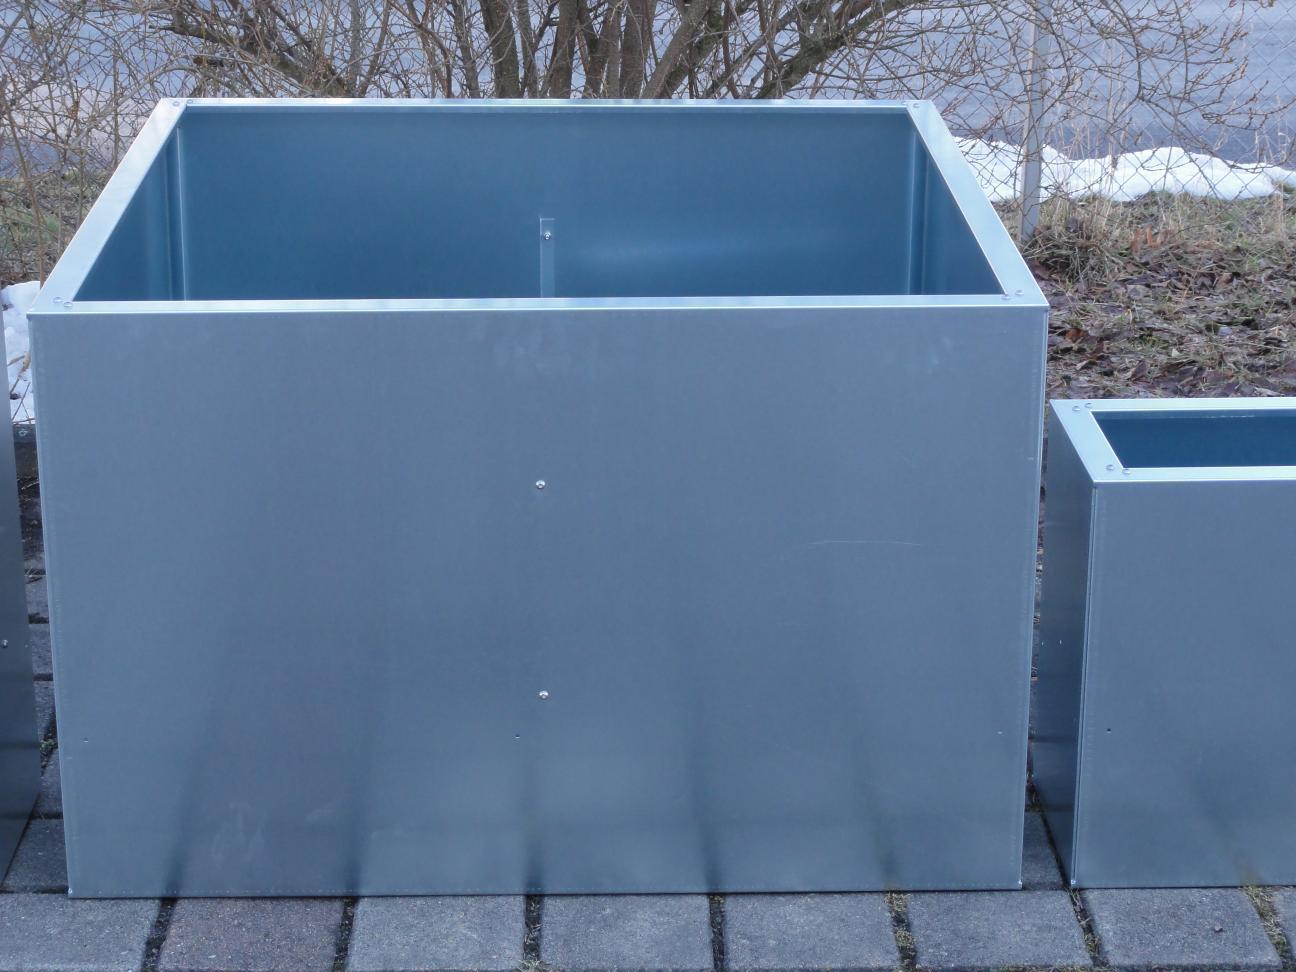 Hochbeet Urban Metall 0 3 M X 0 75 M Hohe 0 5 M Verzinkt